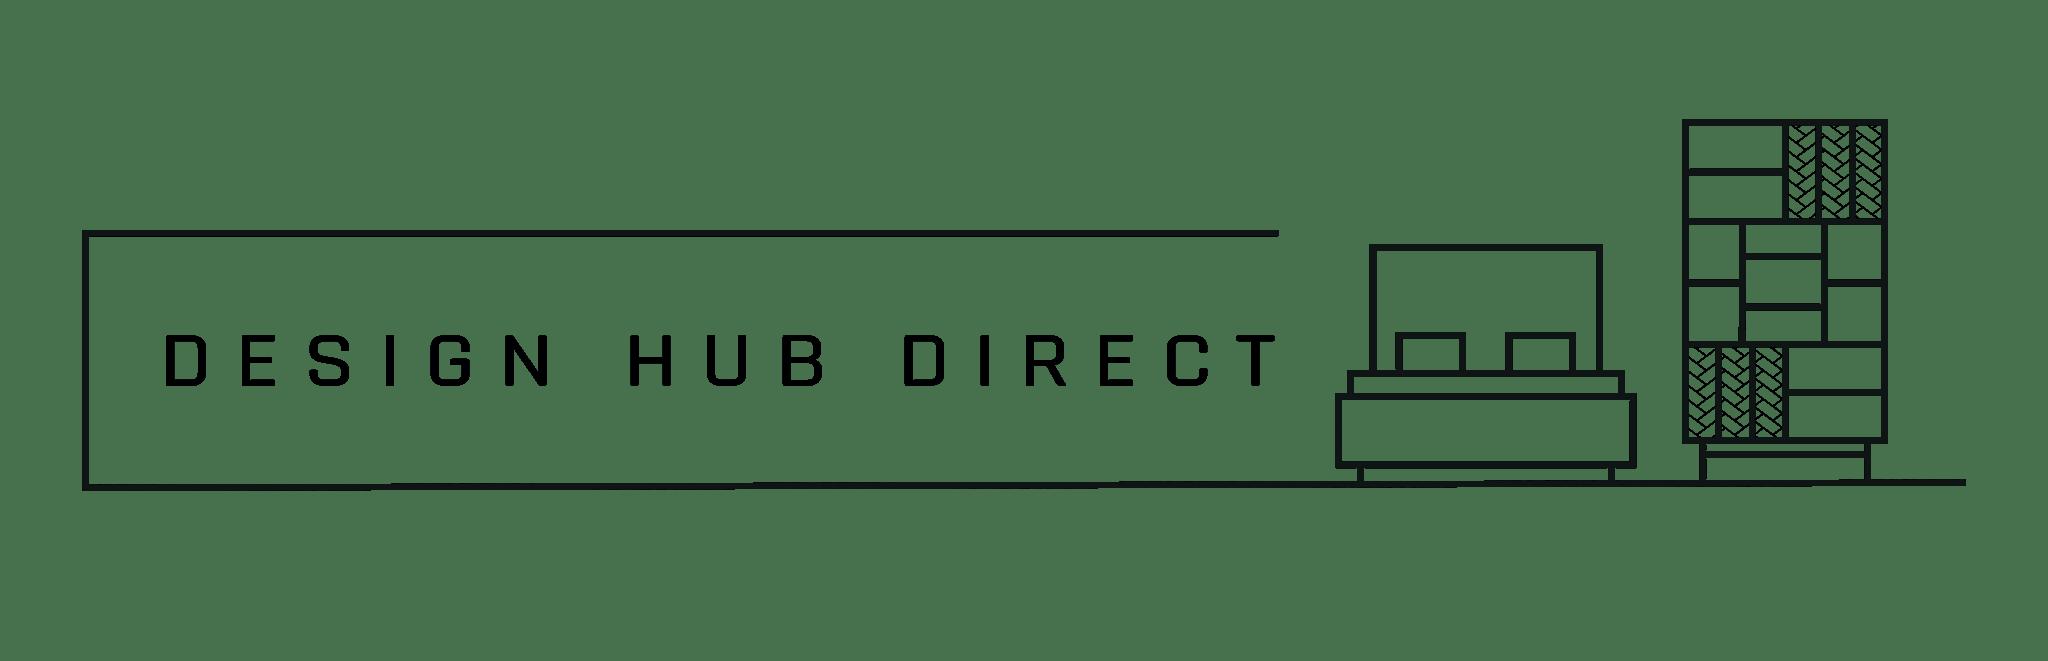 design hub direct logo rectangle 1